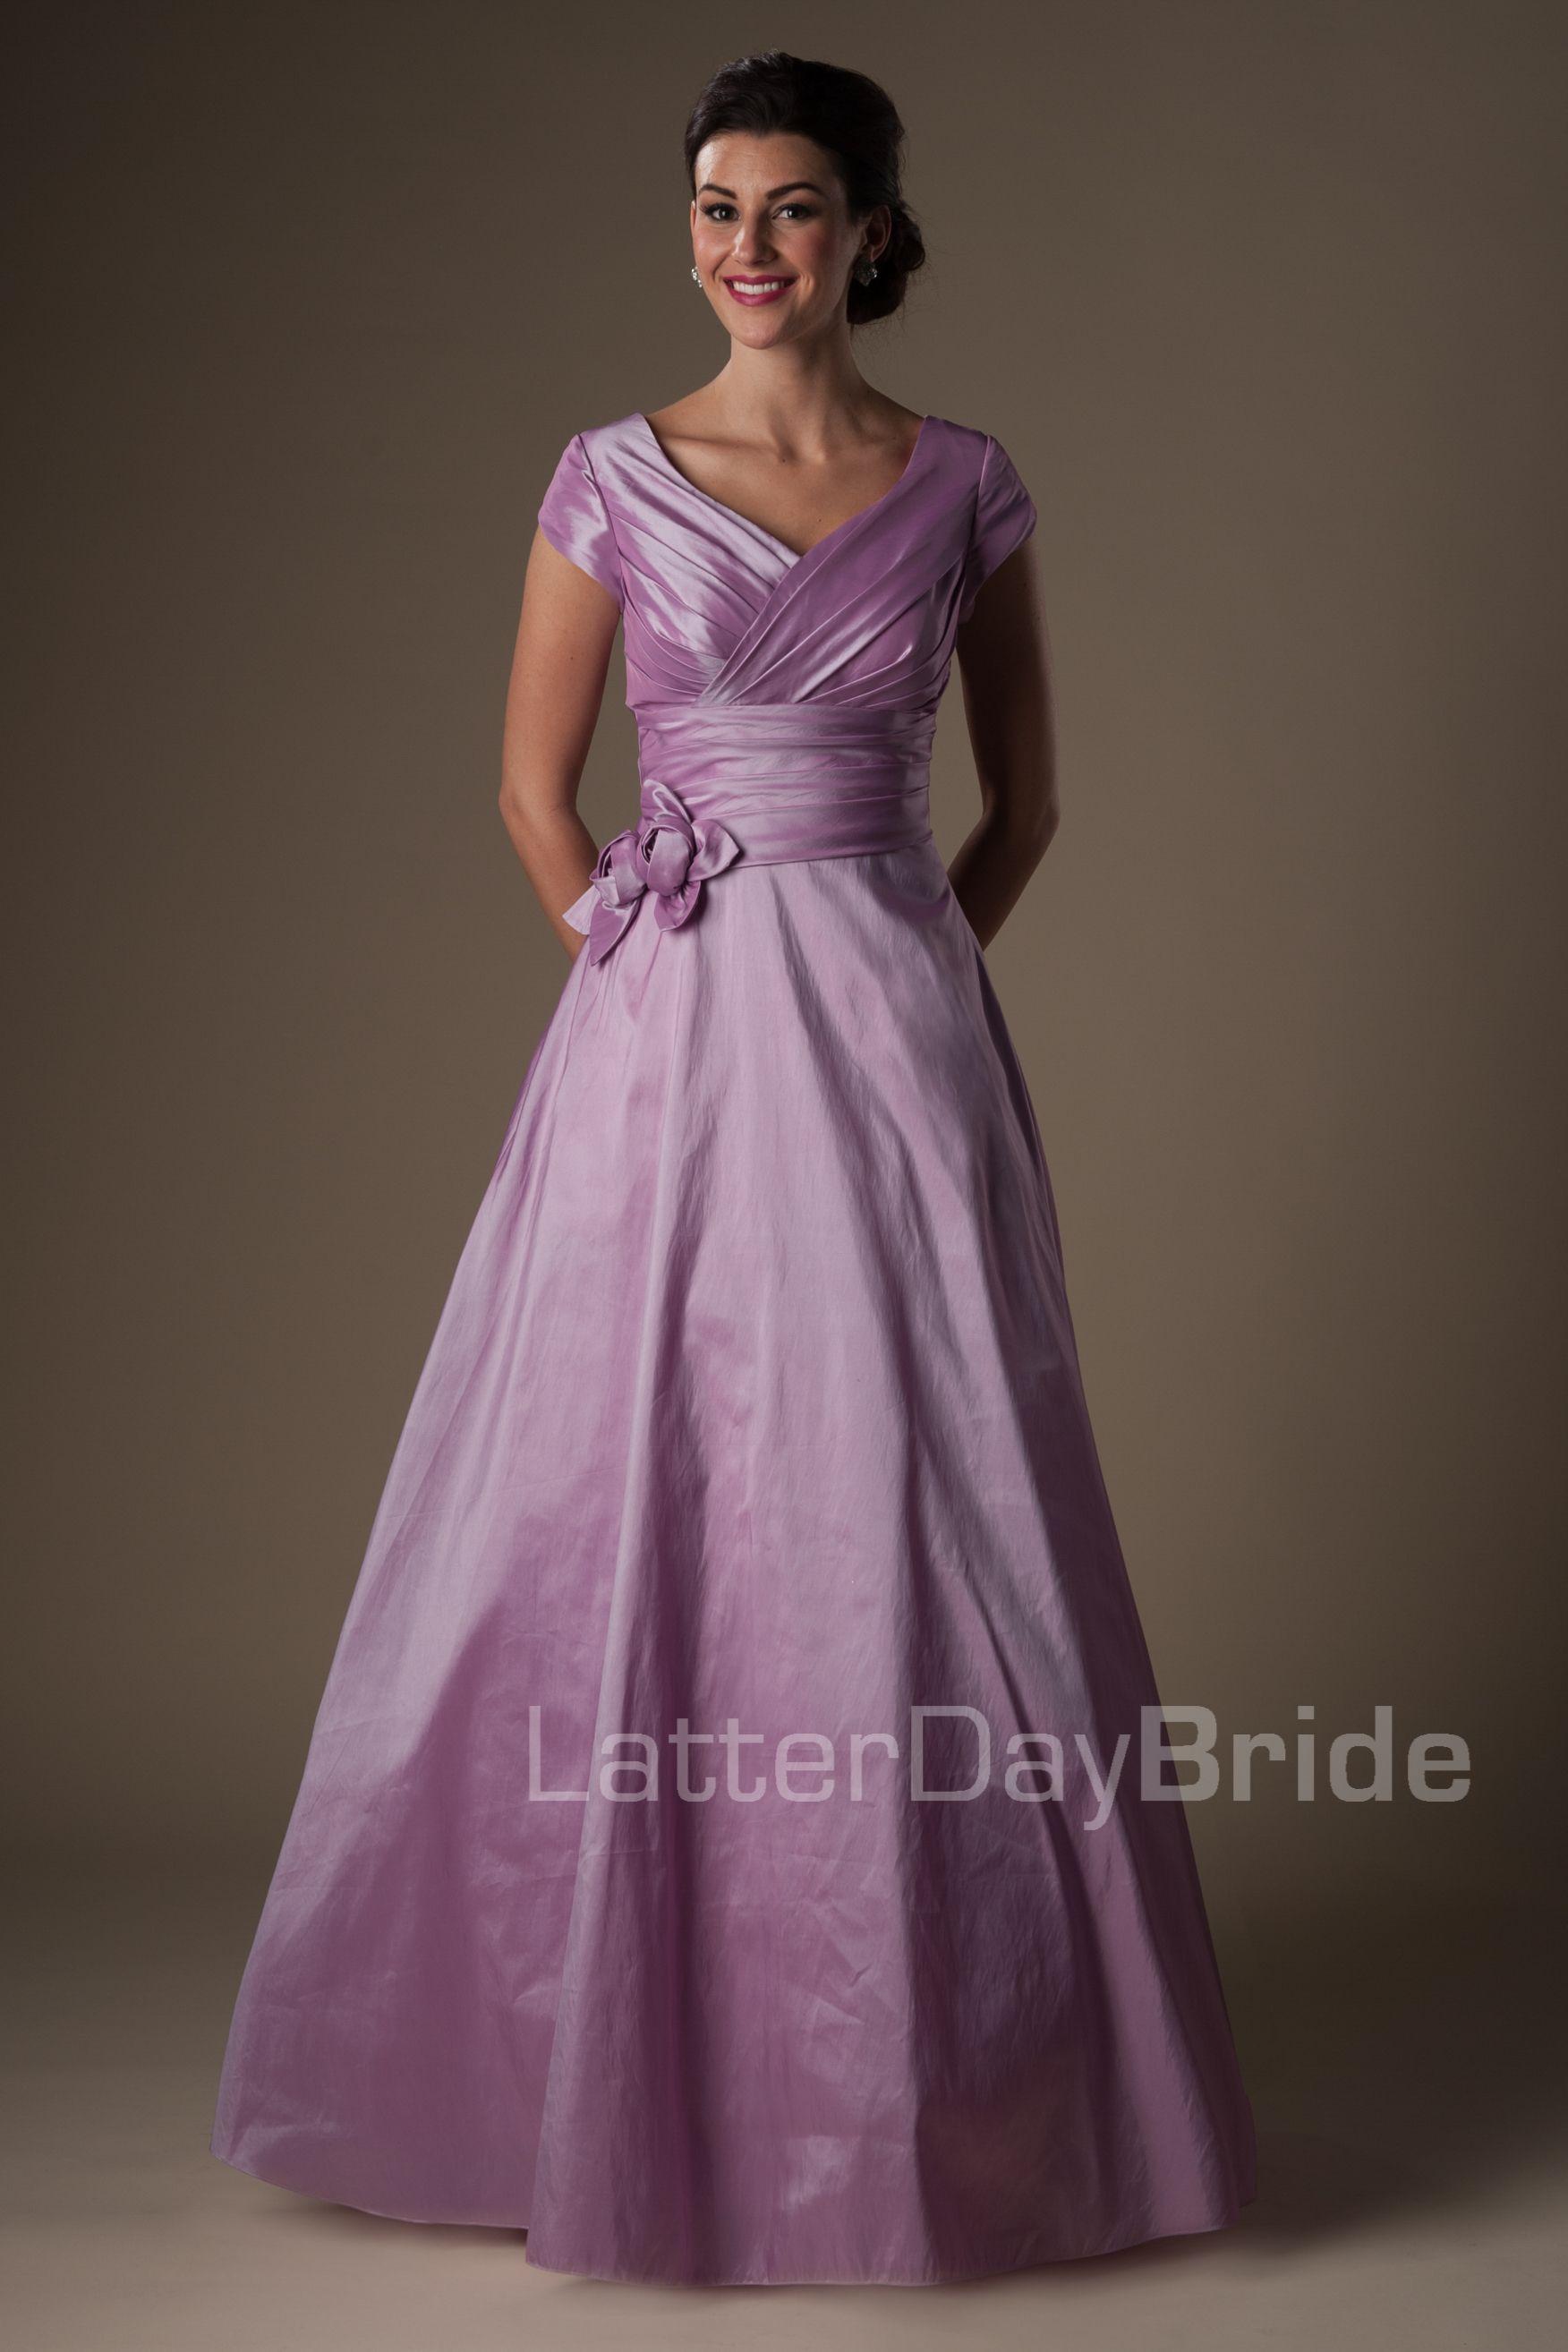 Excepcional Vestidos De Novia De Provo Utah Motivo - Ideas de ...